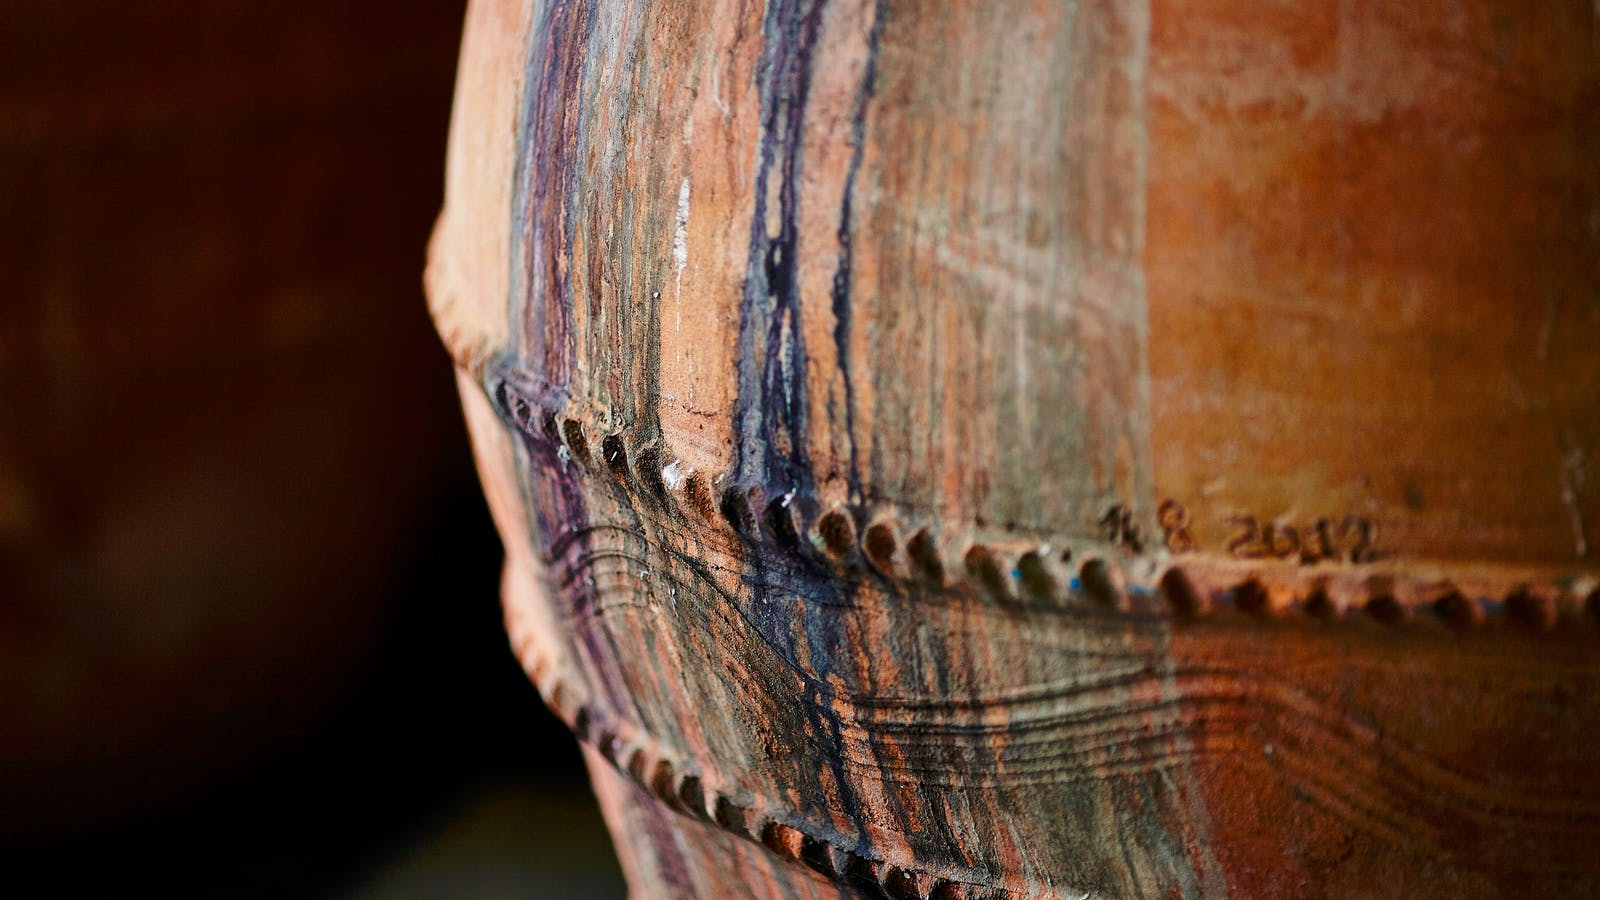 Handmade amphora, full of character